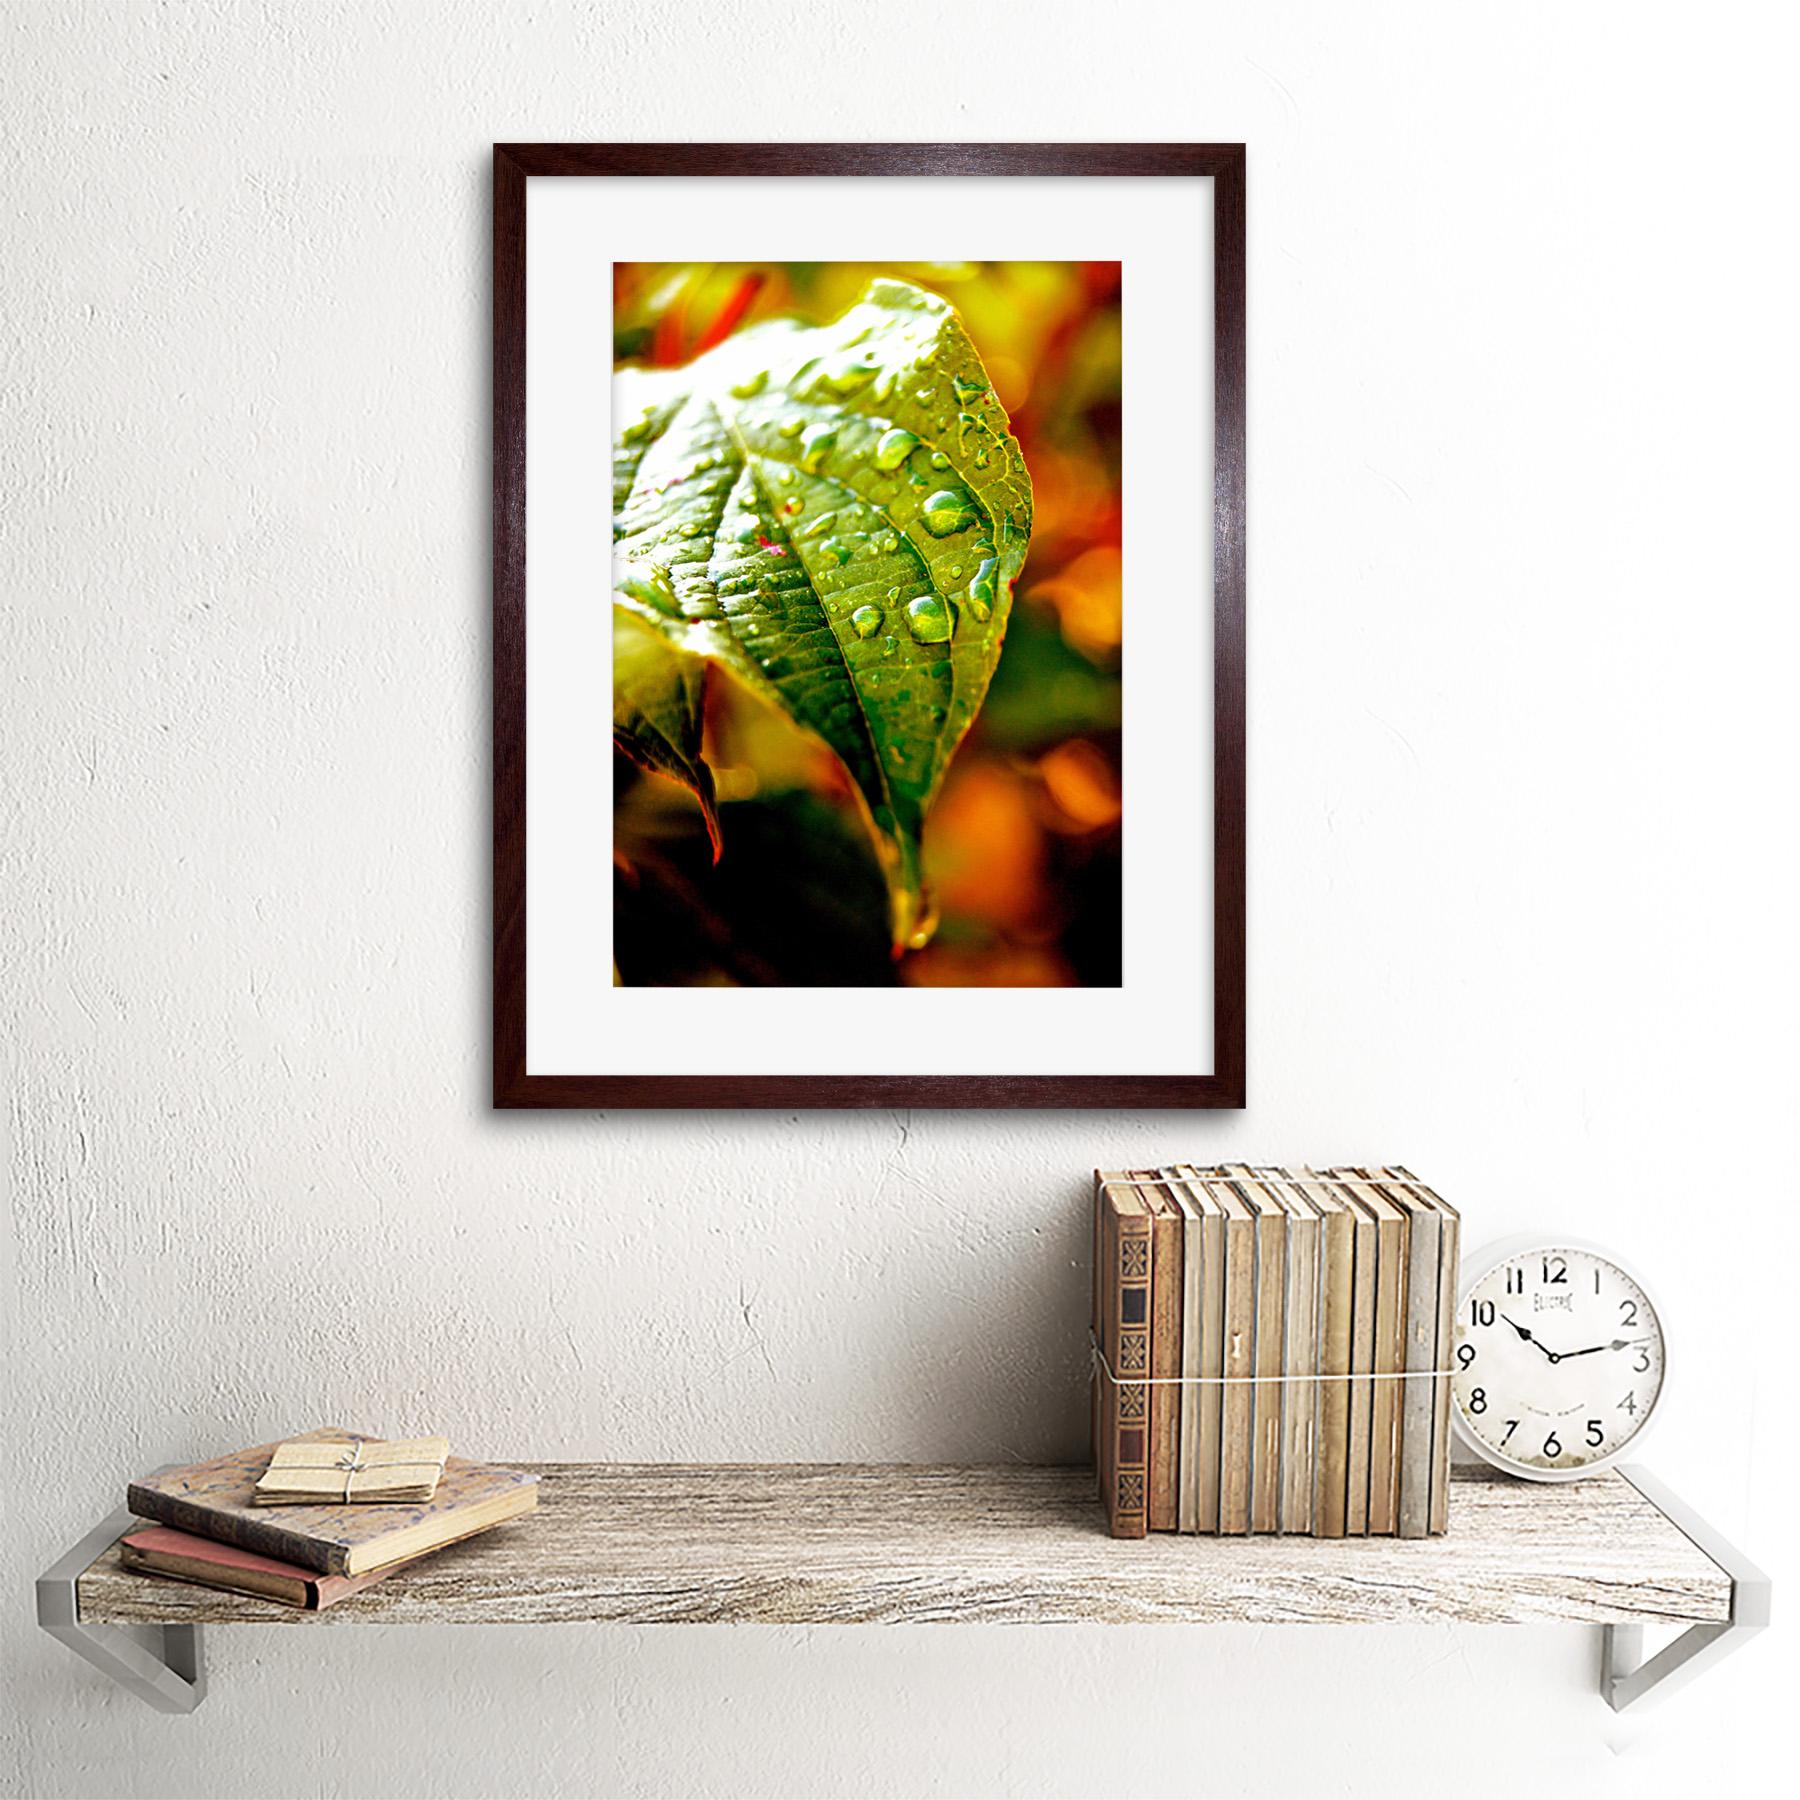 Photo-Leaf-Water-Drop-Green-Nature-Framed-Print-12x16-Inch miniatuur 8